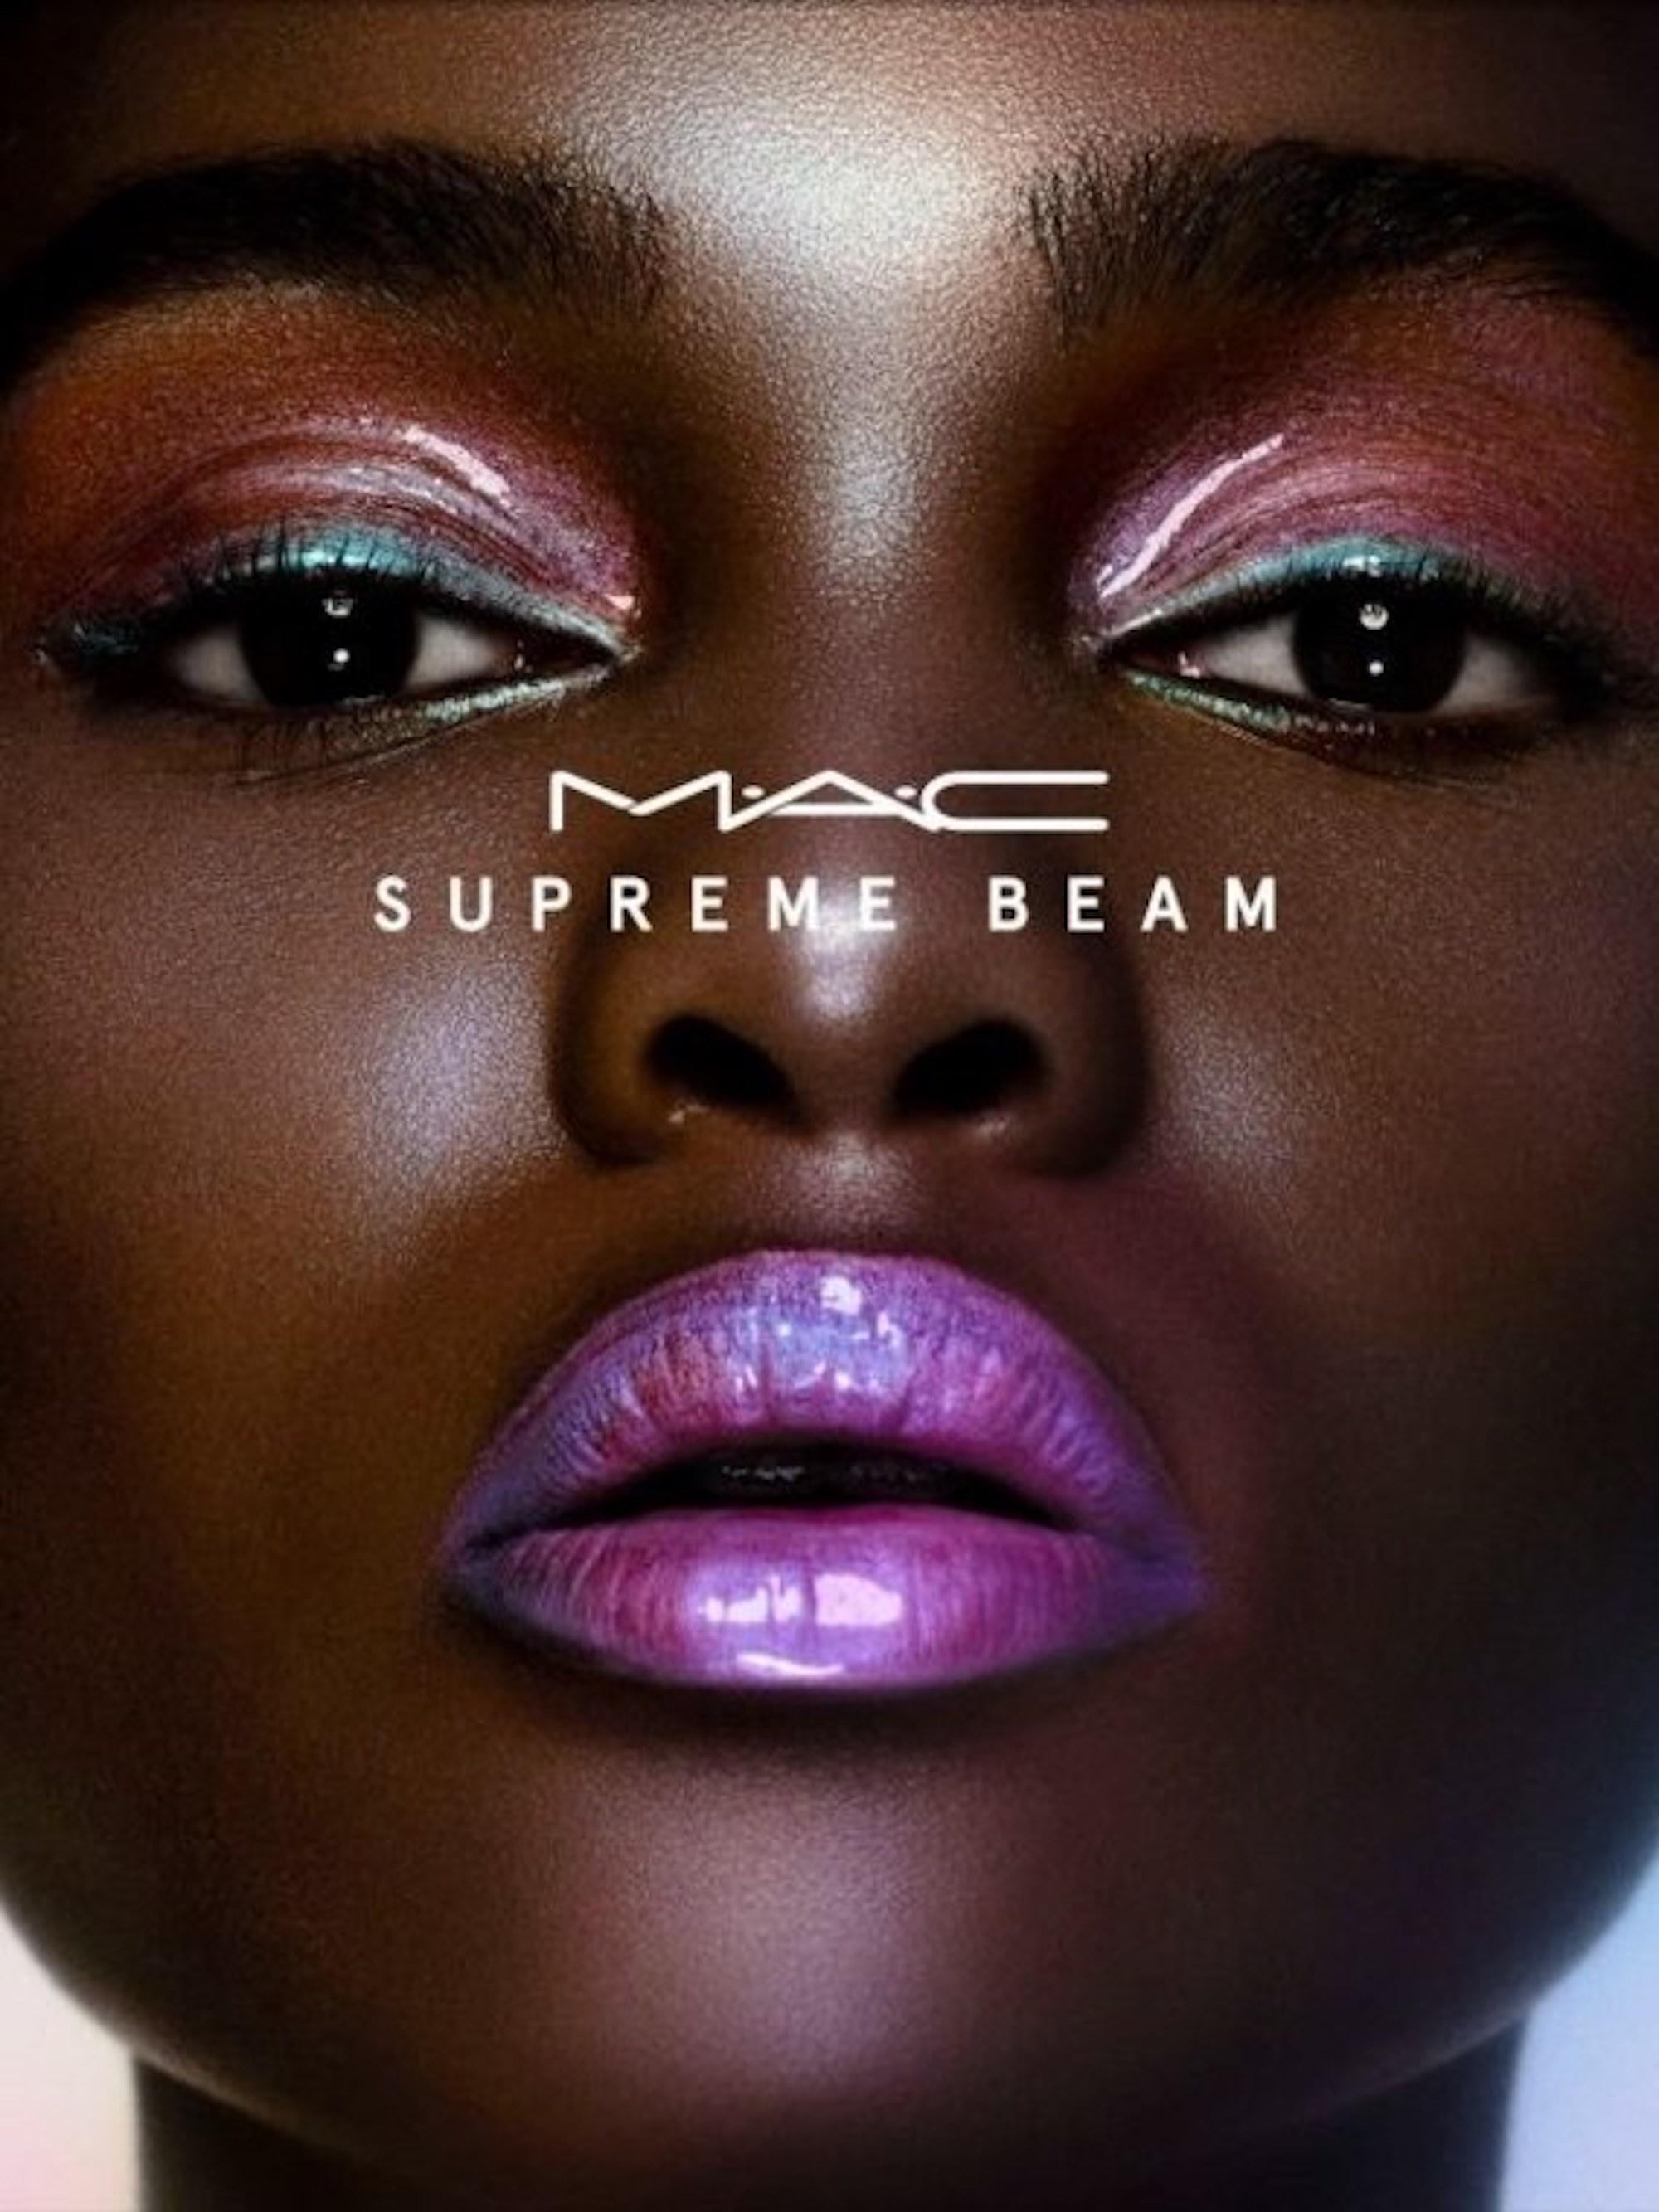 make up die 39 supreme beam 39 collection von mac cosmetics. Black Bedroom Furniture Sets. Home Design Ideas